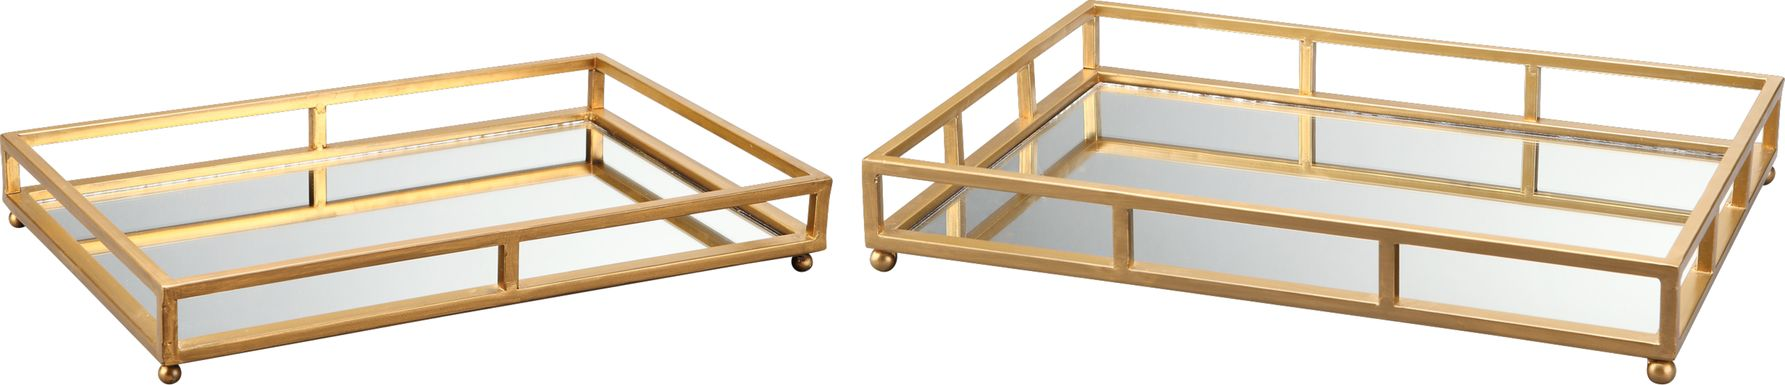 Nimitz Gold Trays Set of 2